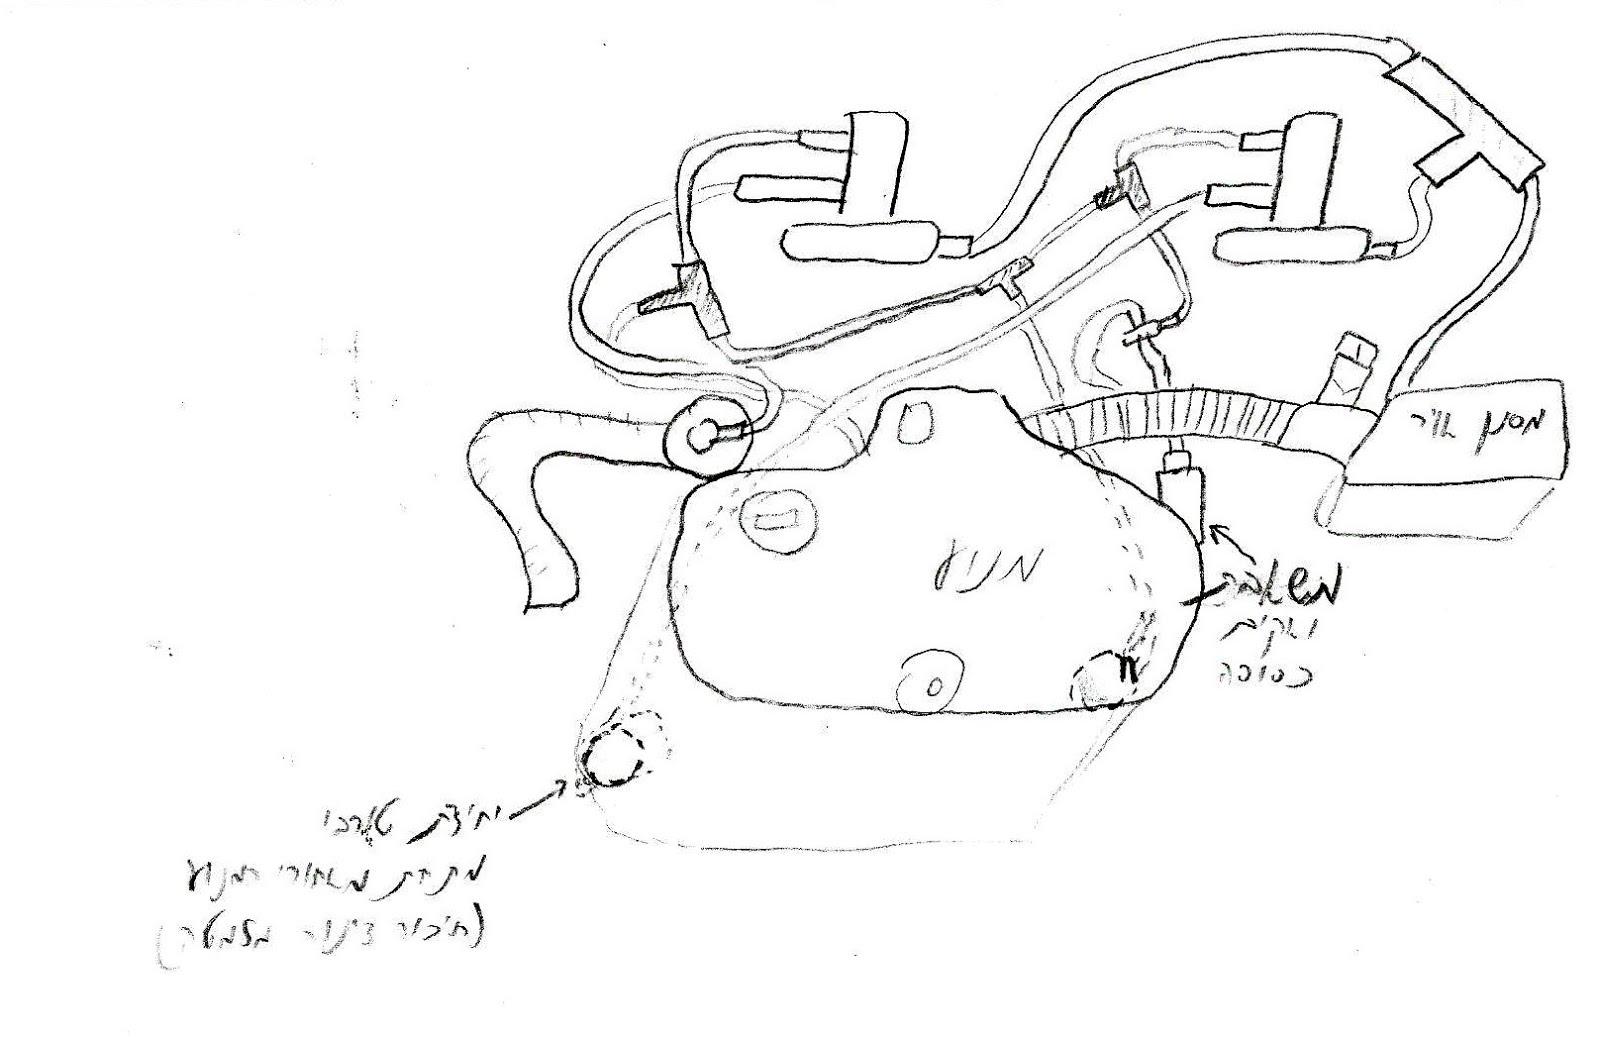 Me Ol Blog Skoda Octavia Mk 2 Year 2002 Vacuum Pipes Layout Engine Diagrams Top View Of